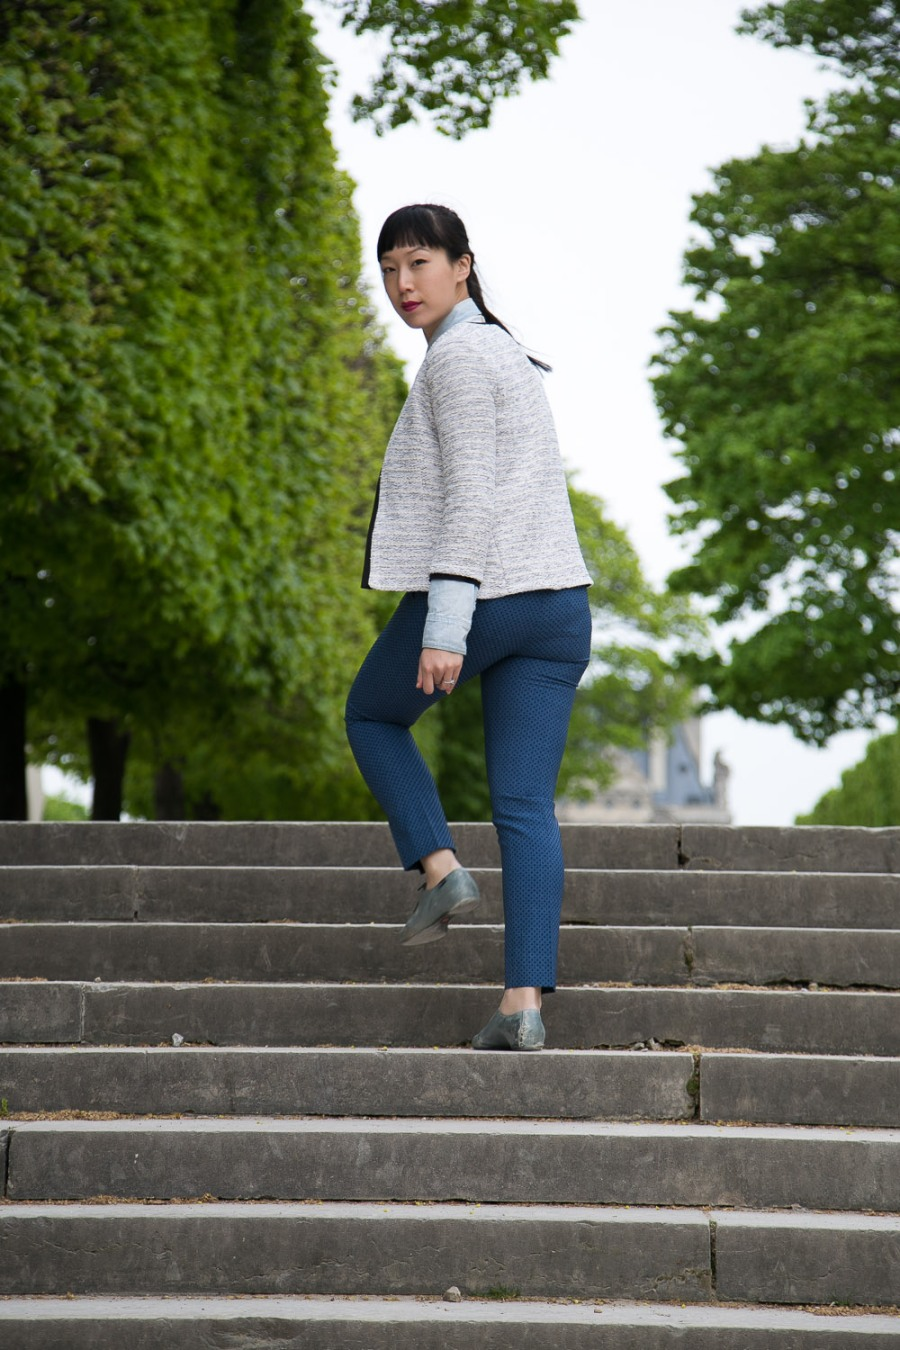 Boucle-Tuileries-Garden-5